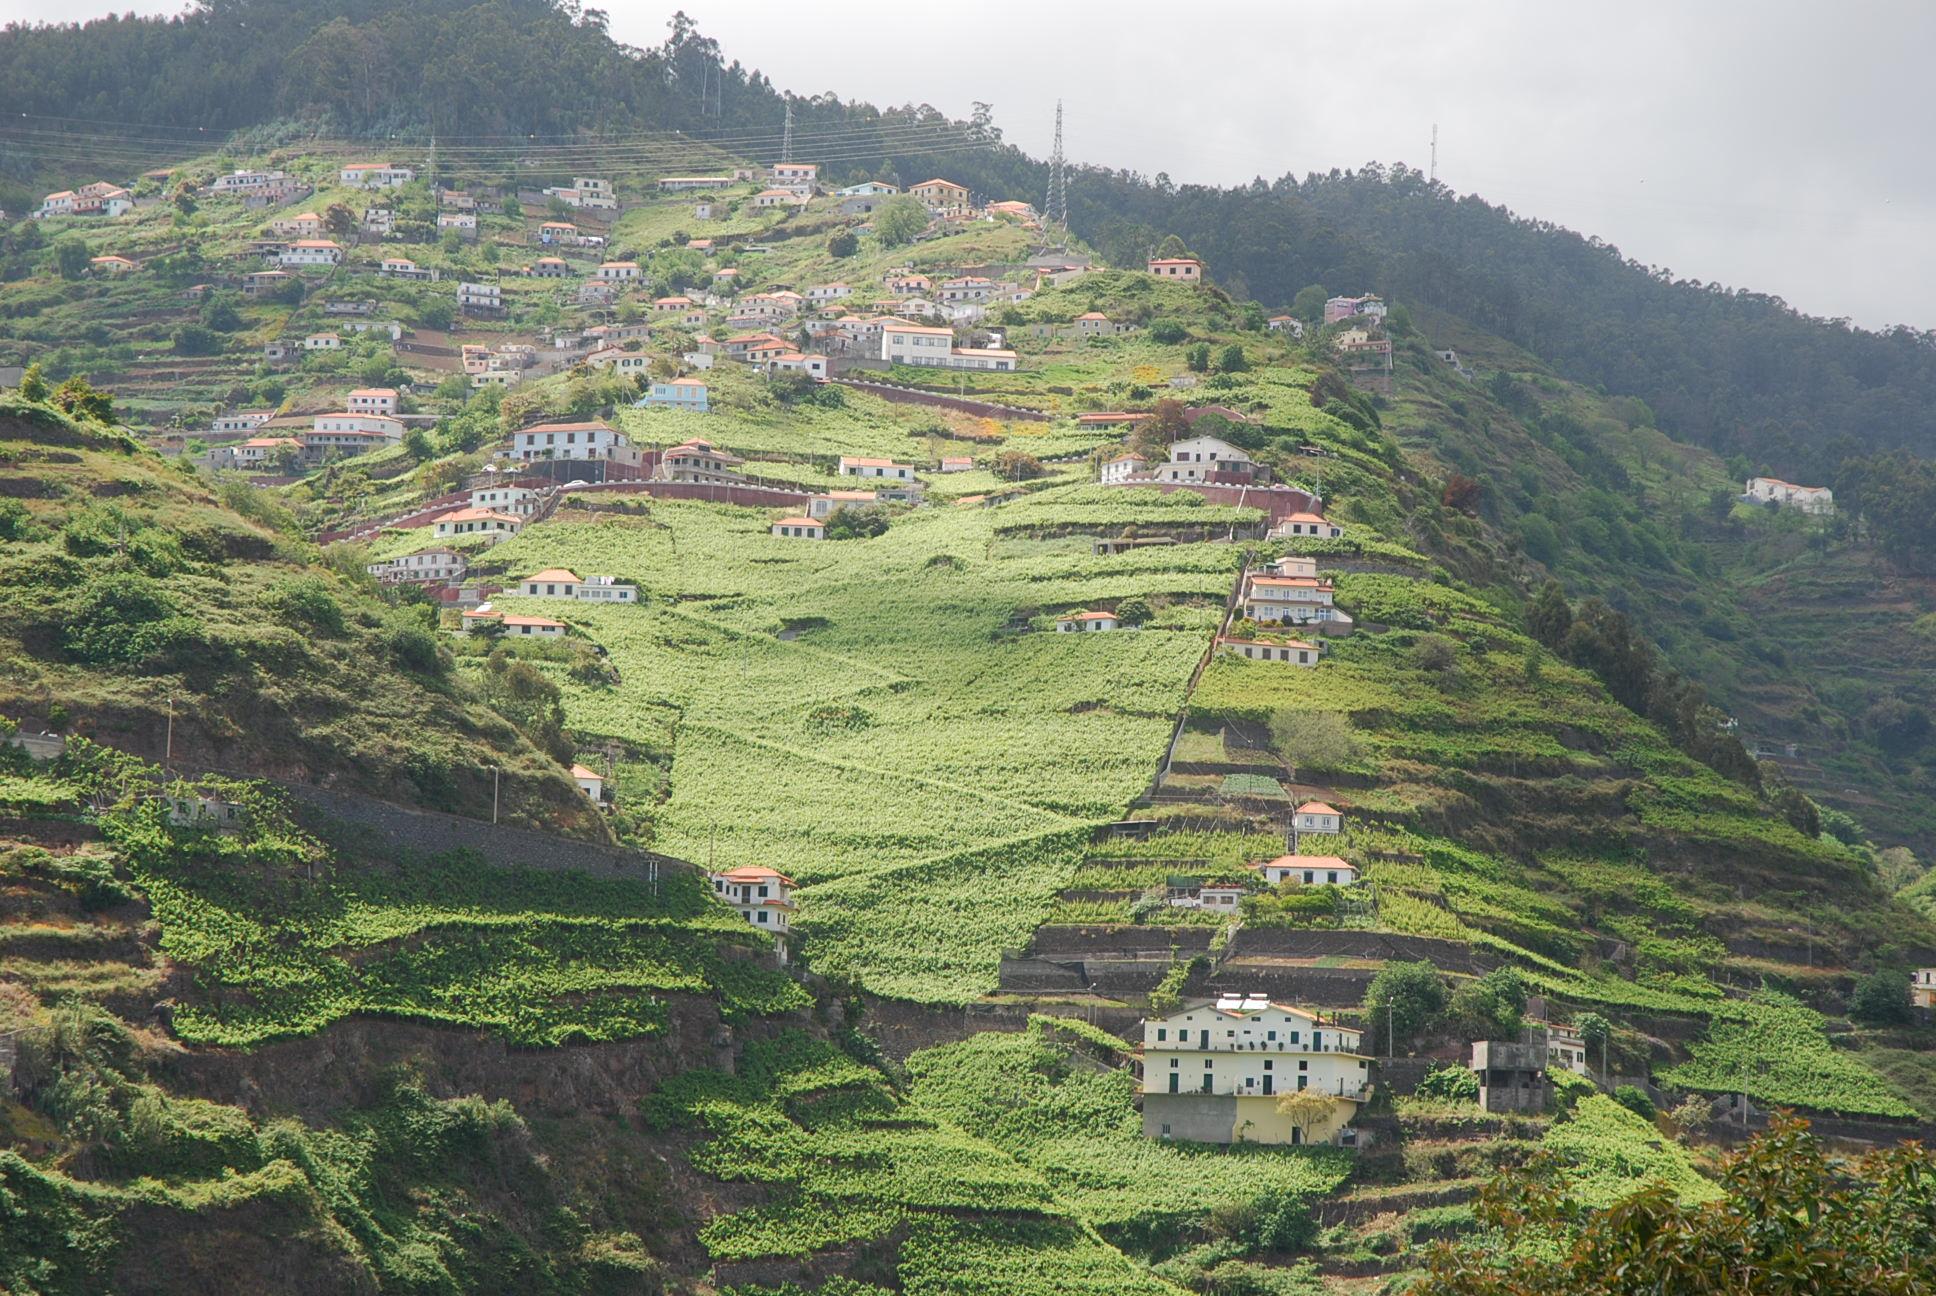 Latada vineyards of Madeira (Broadbent)